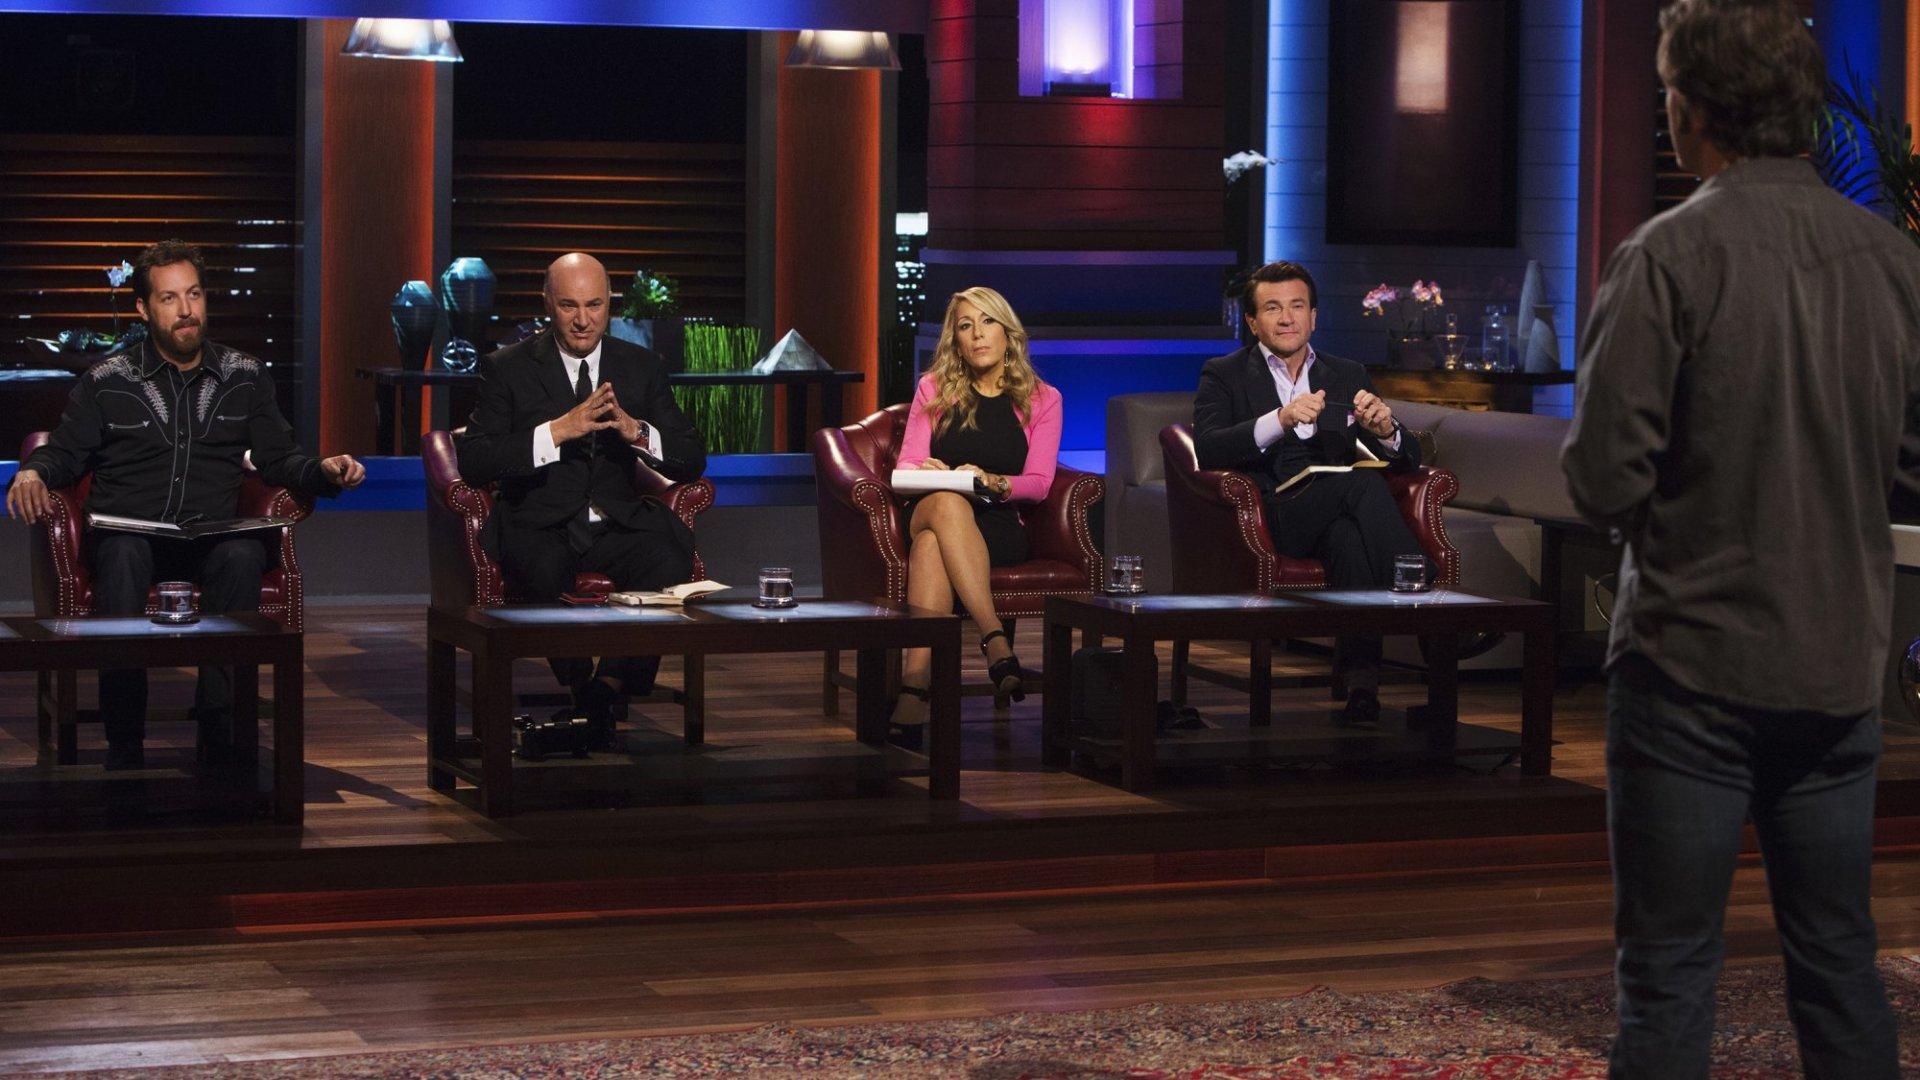 Chris Sacca, Kevin O'Leary, Lori Greiner, and Robert Herjavec on 'Shark Tank.'